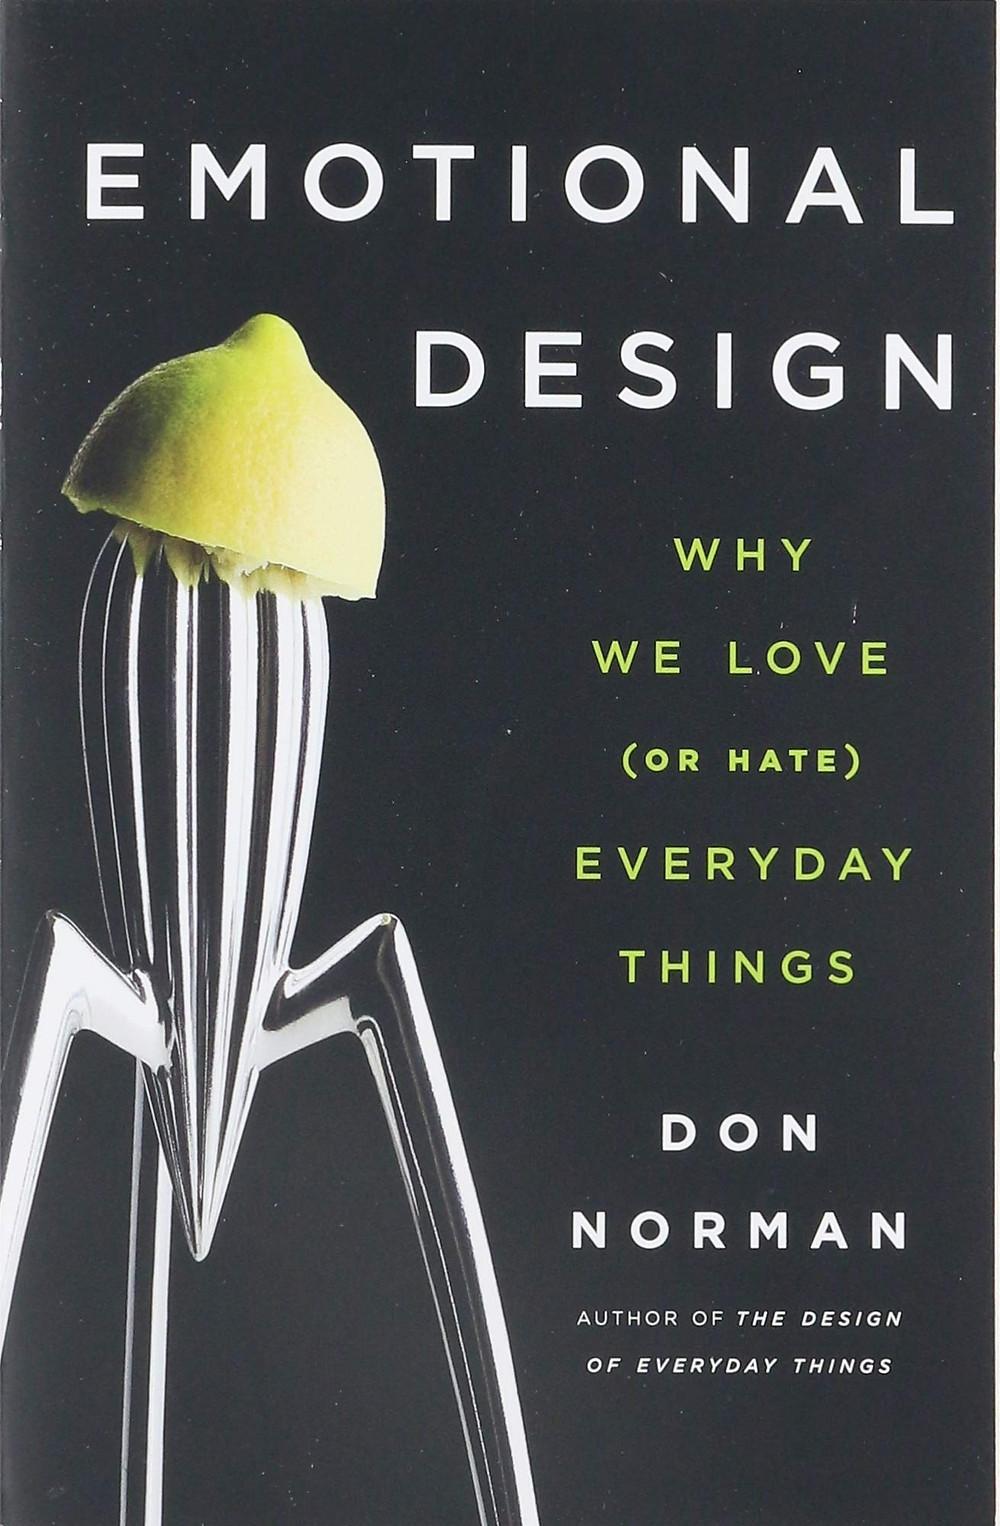 Emotional Design Cover Image